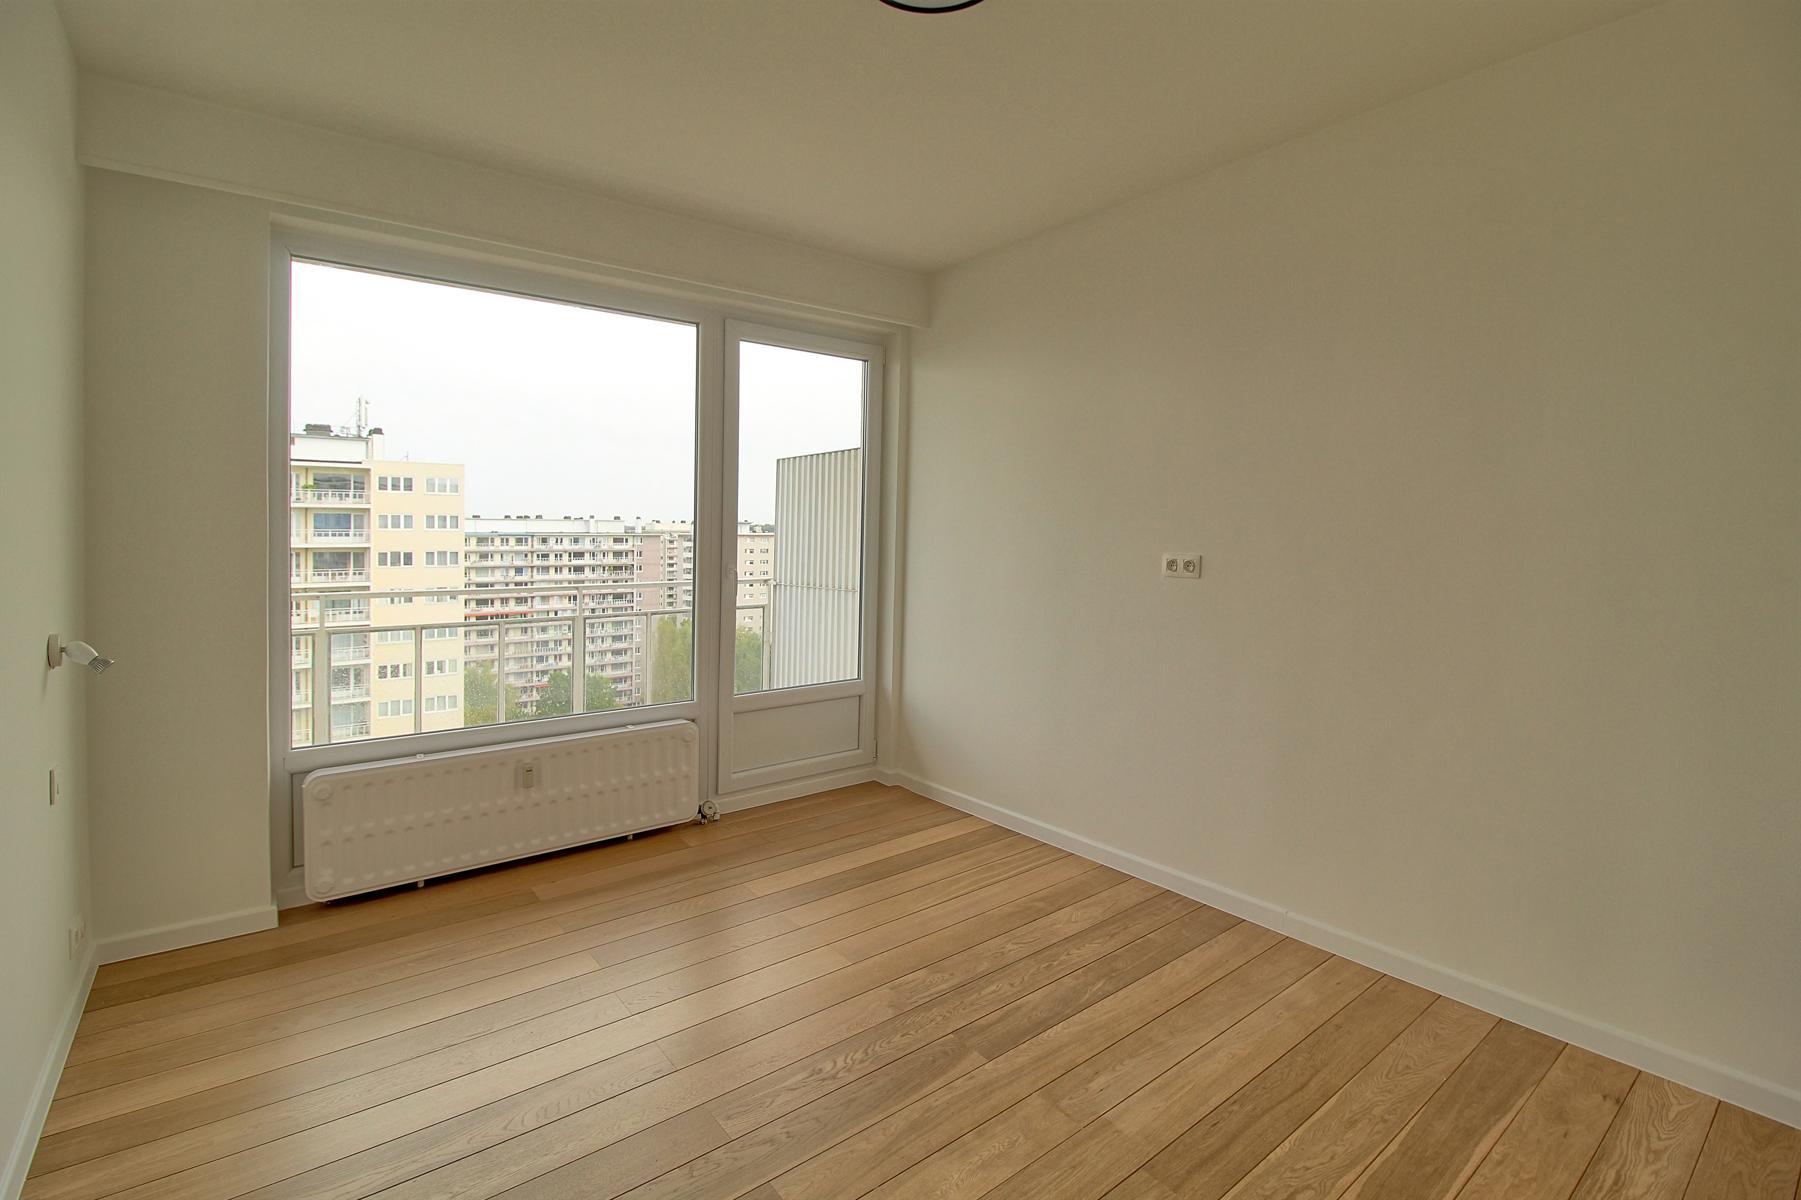 Appartement - Auderghem - #4530902-2